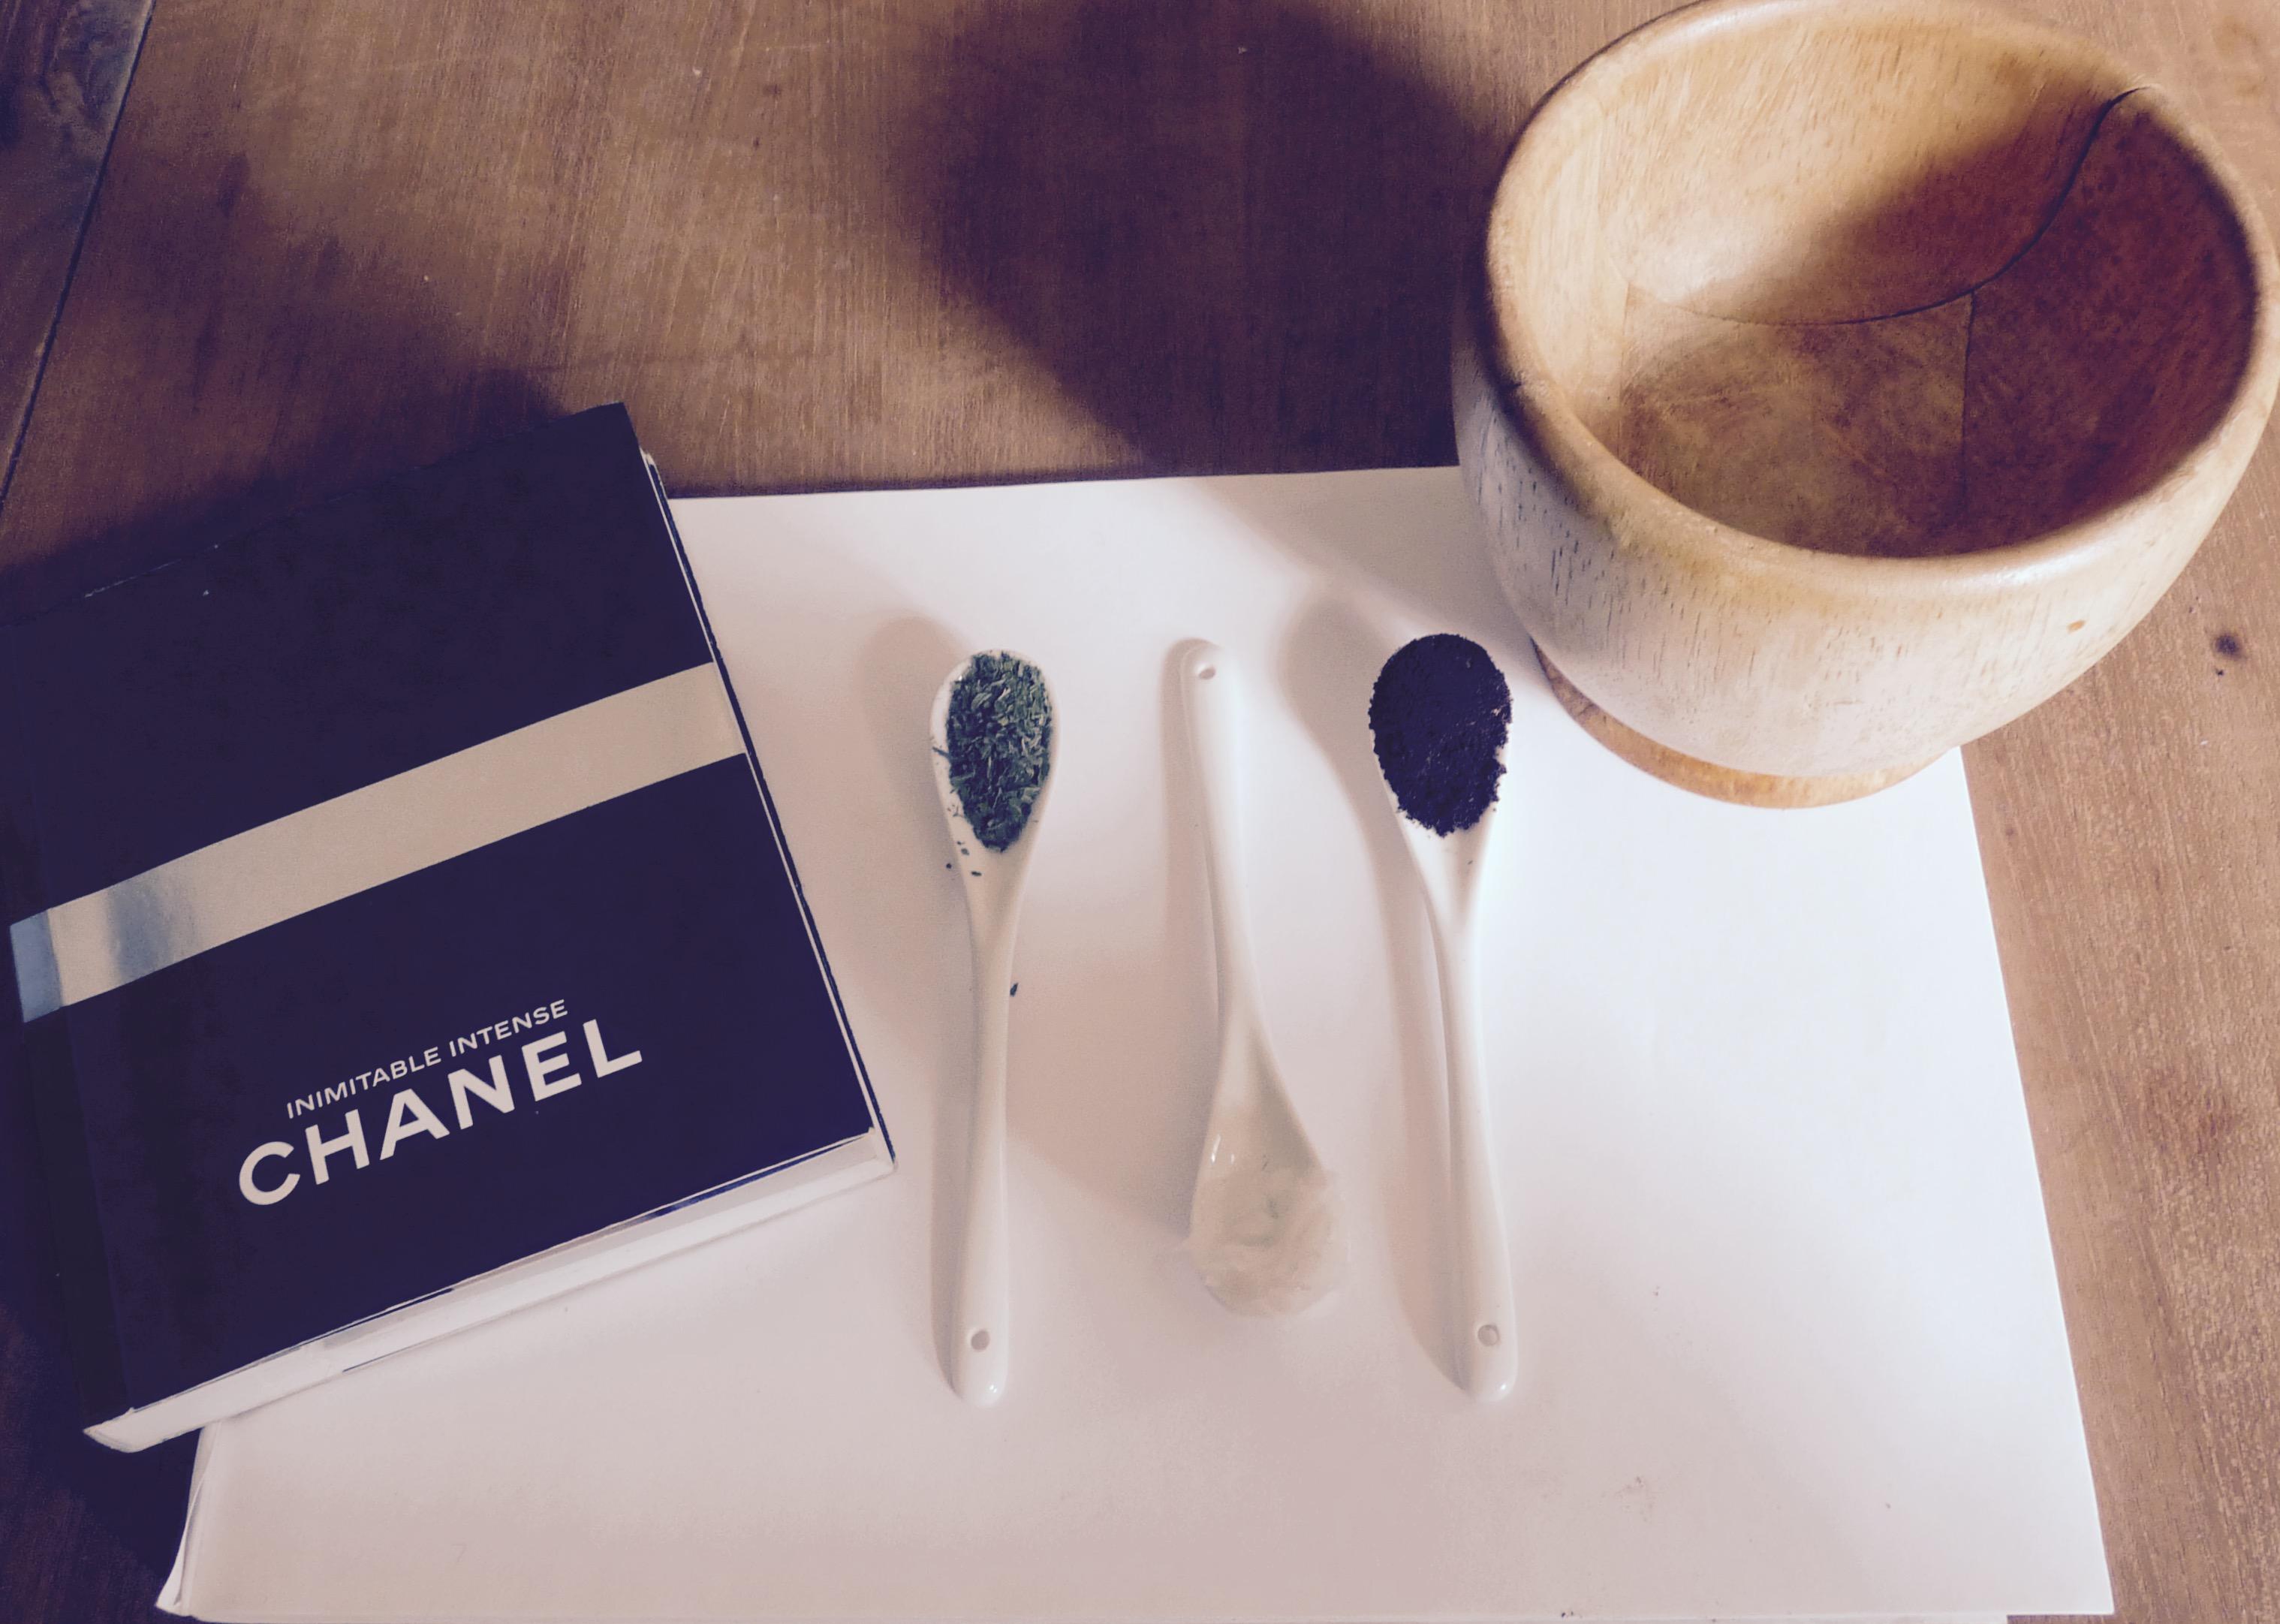 DIY: Lipscrub! Vollere zachte lippen? Maak je eigen lipscrub van koffie, munt en cocosolie.